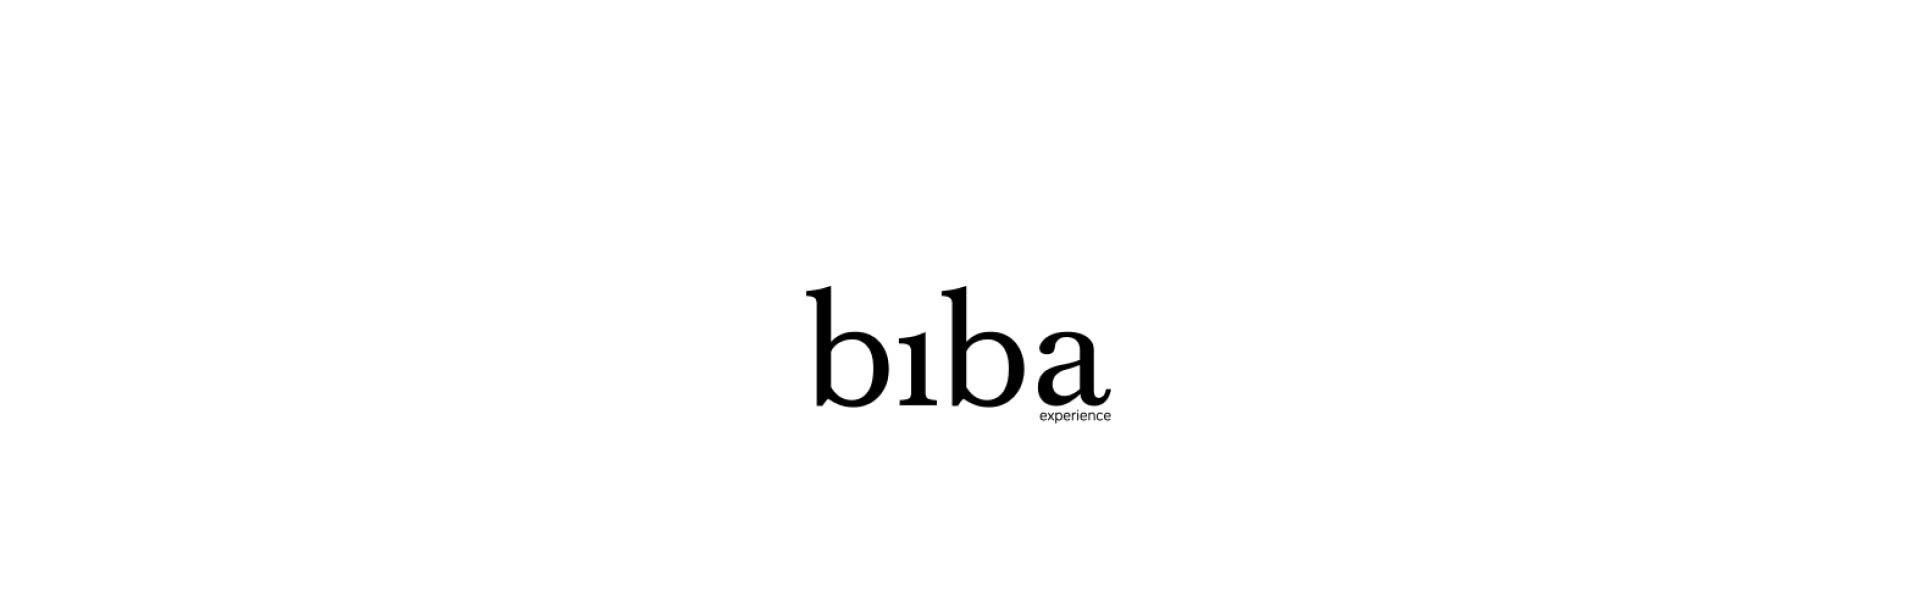 De leukste fashion sieraden van BIBA shopt u bij It's Beautiful!